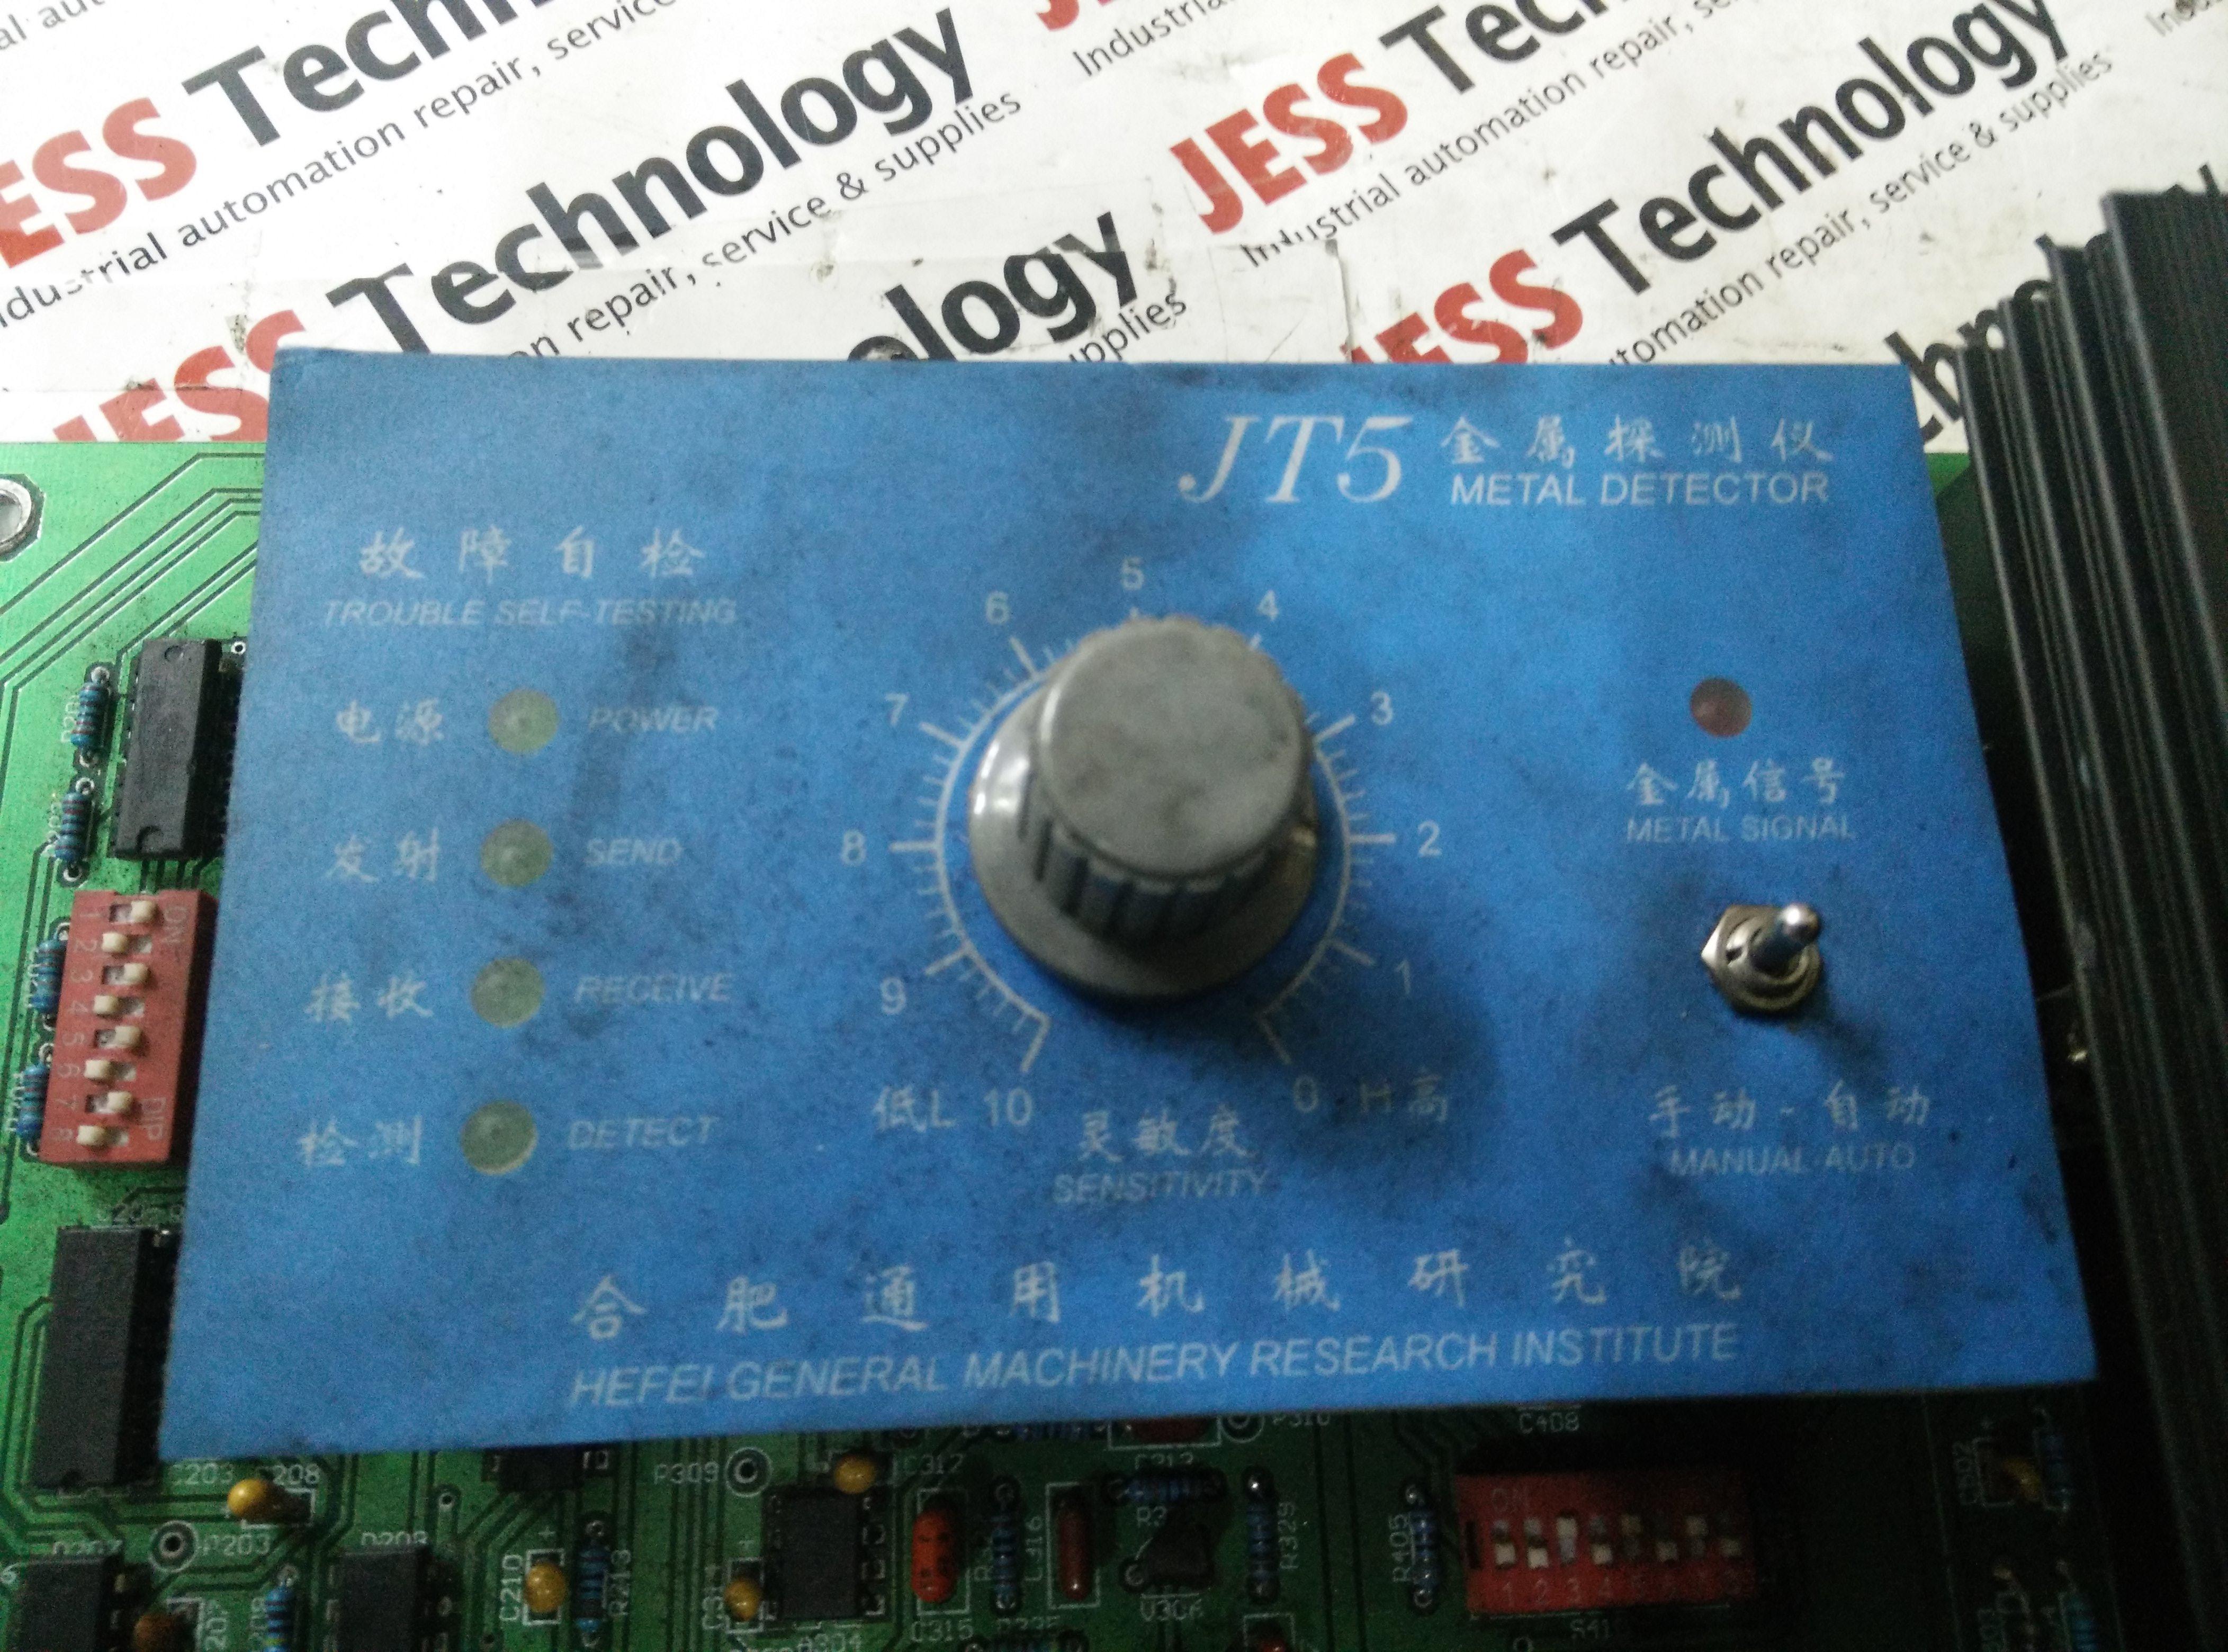 Repair JT5-A EVCO METAL DETECTOR PCB BOARD in Malaysia, Singapore, Thailand, Indonesia